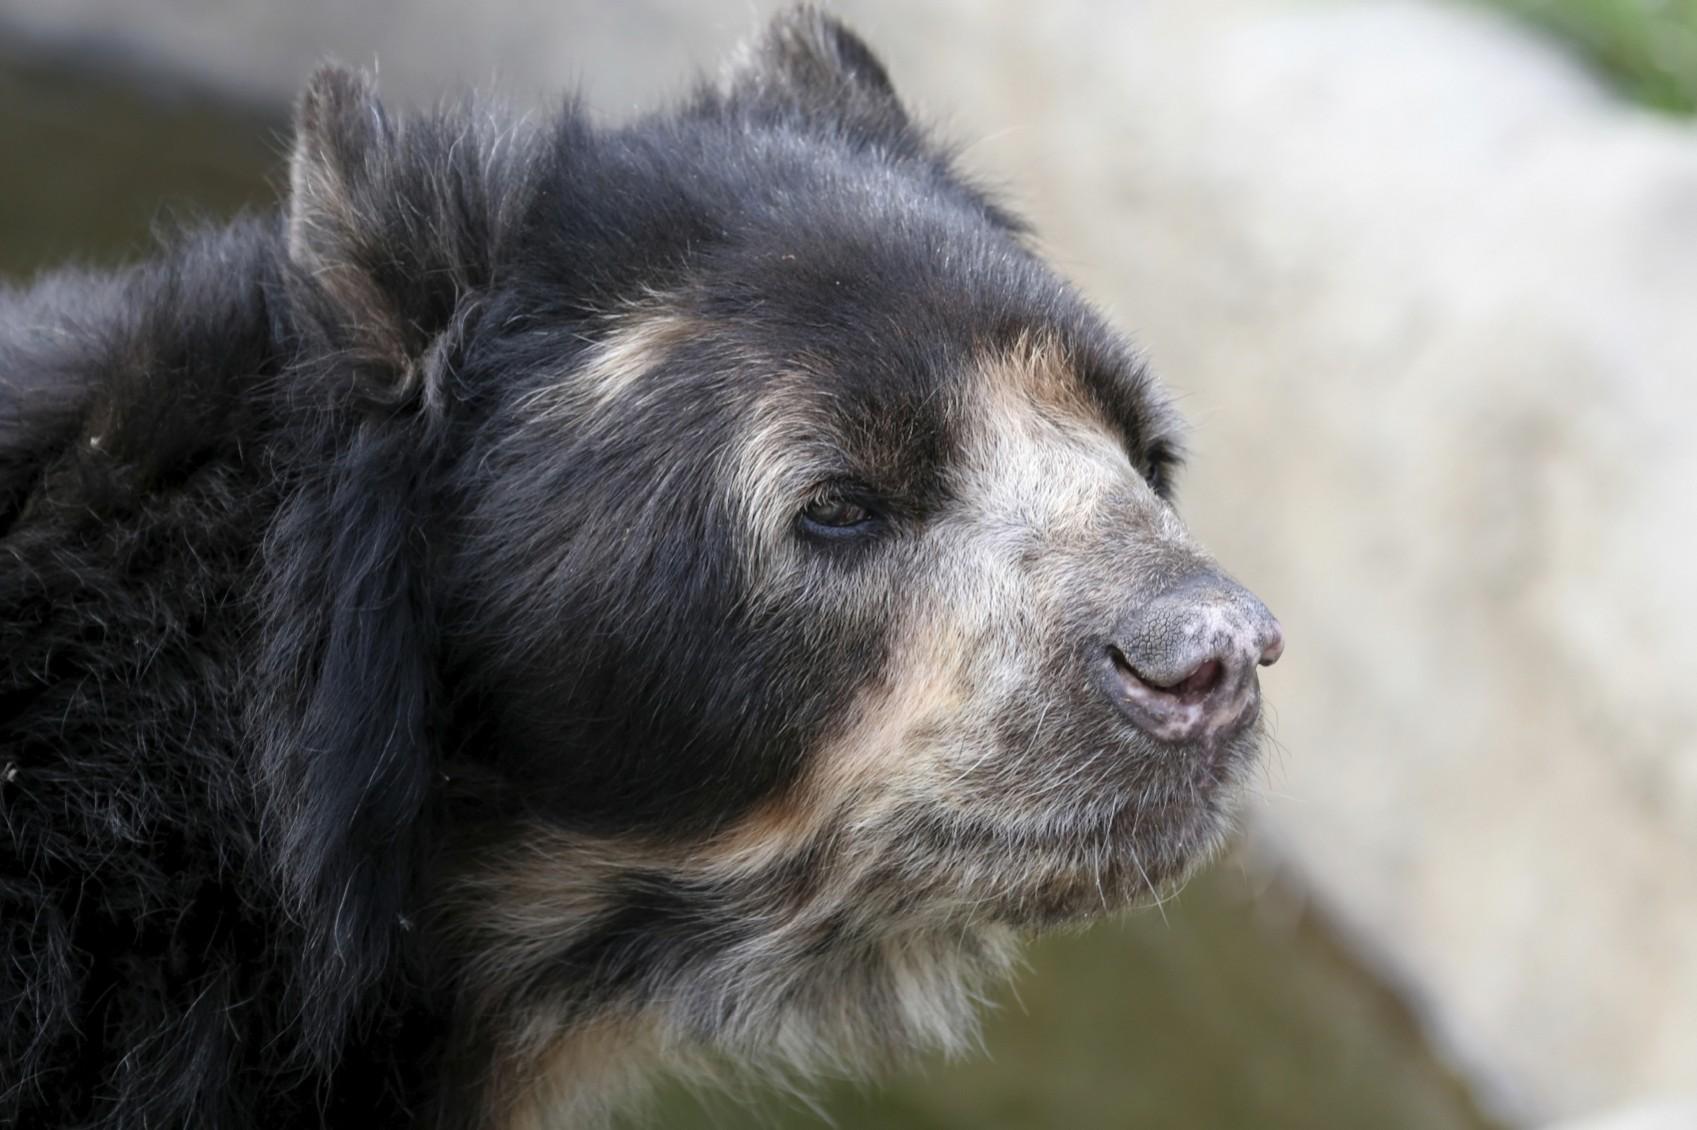 per46-speckeled-bear-free-istock-000001002848